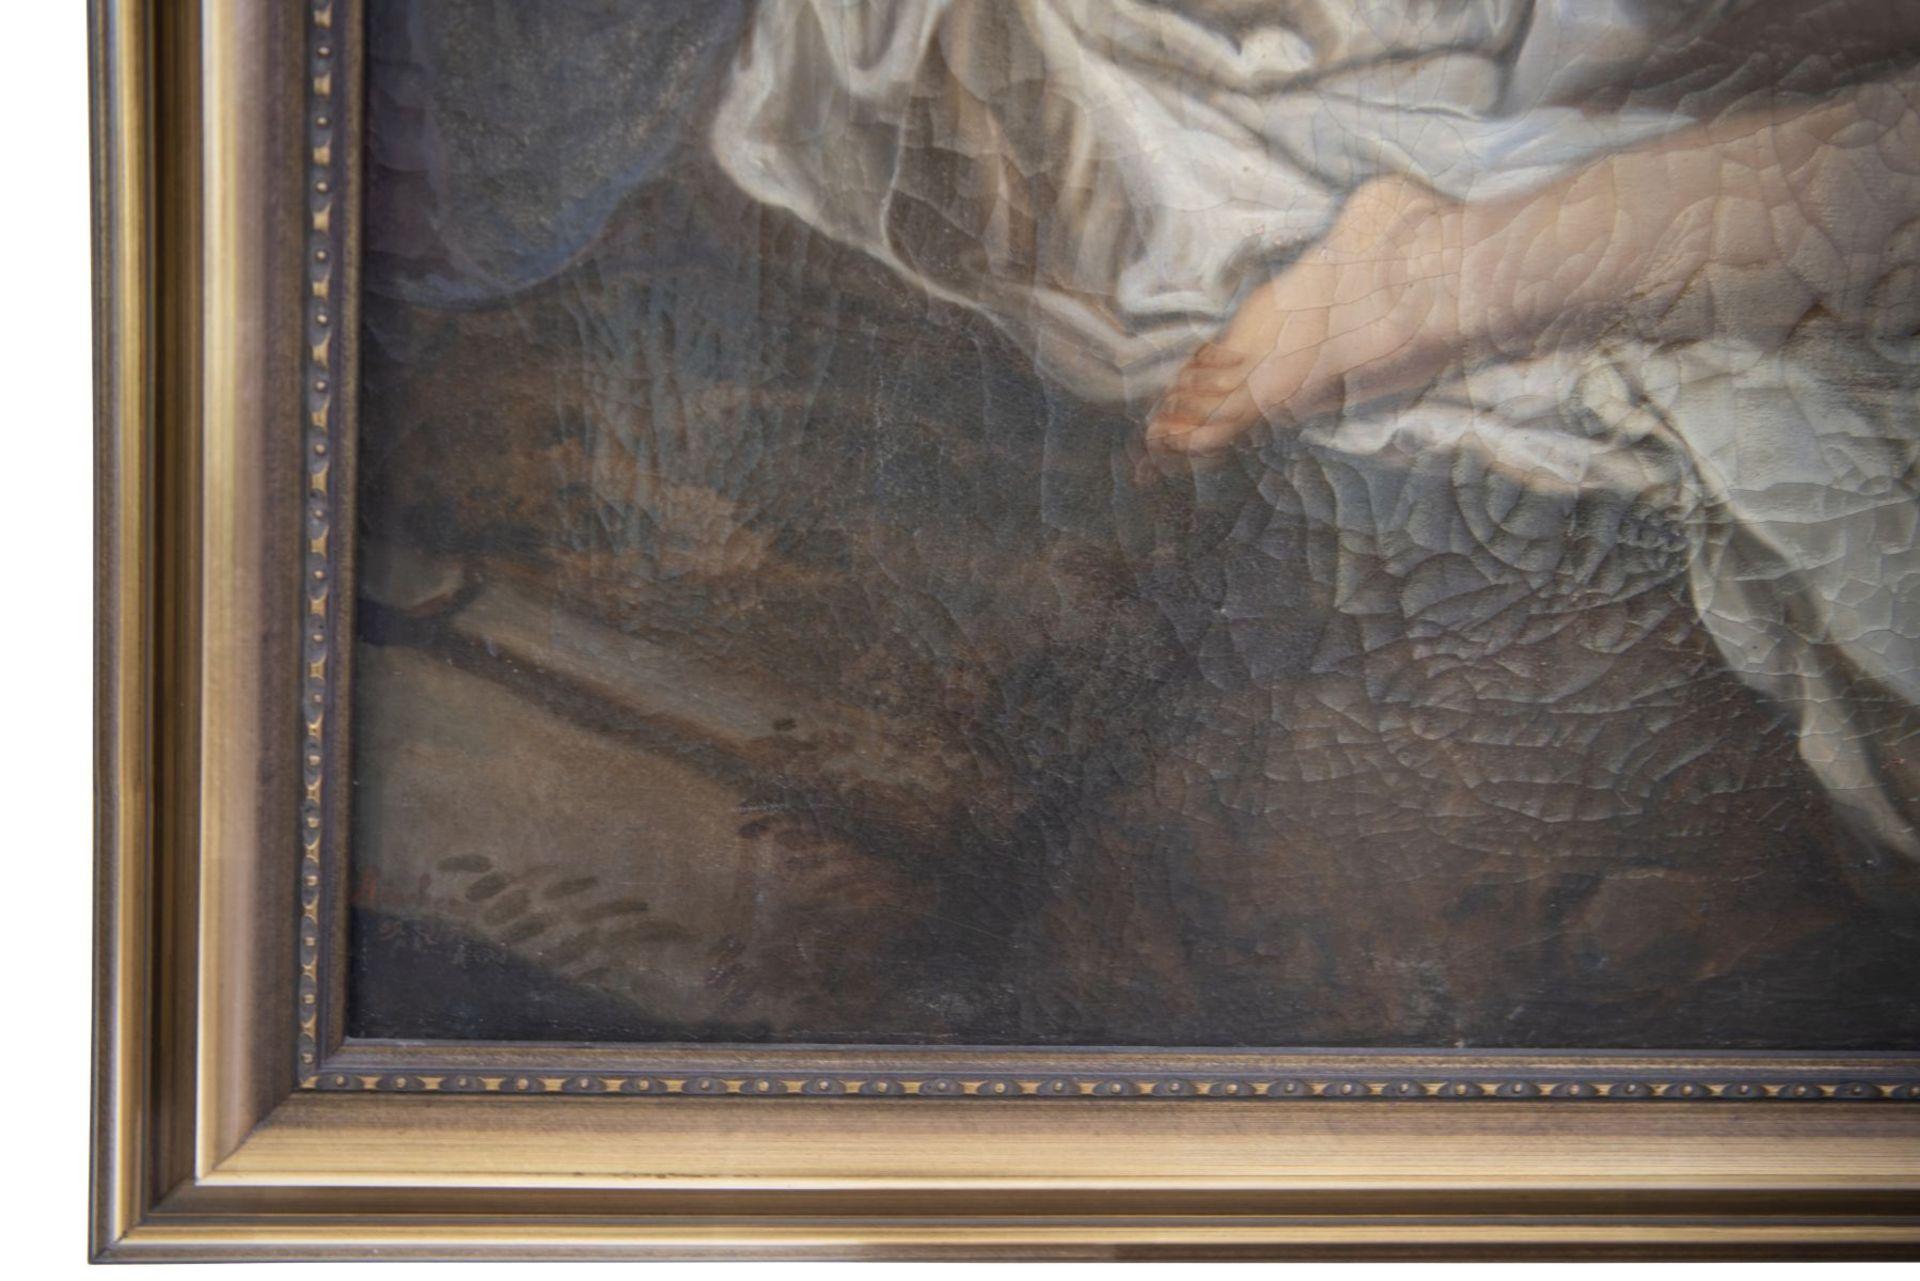 "After Jean Baptiste Sauterre, France around 1800 ""Susanna in the bath"" - Image 4 of 7"